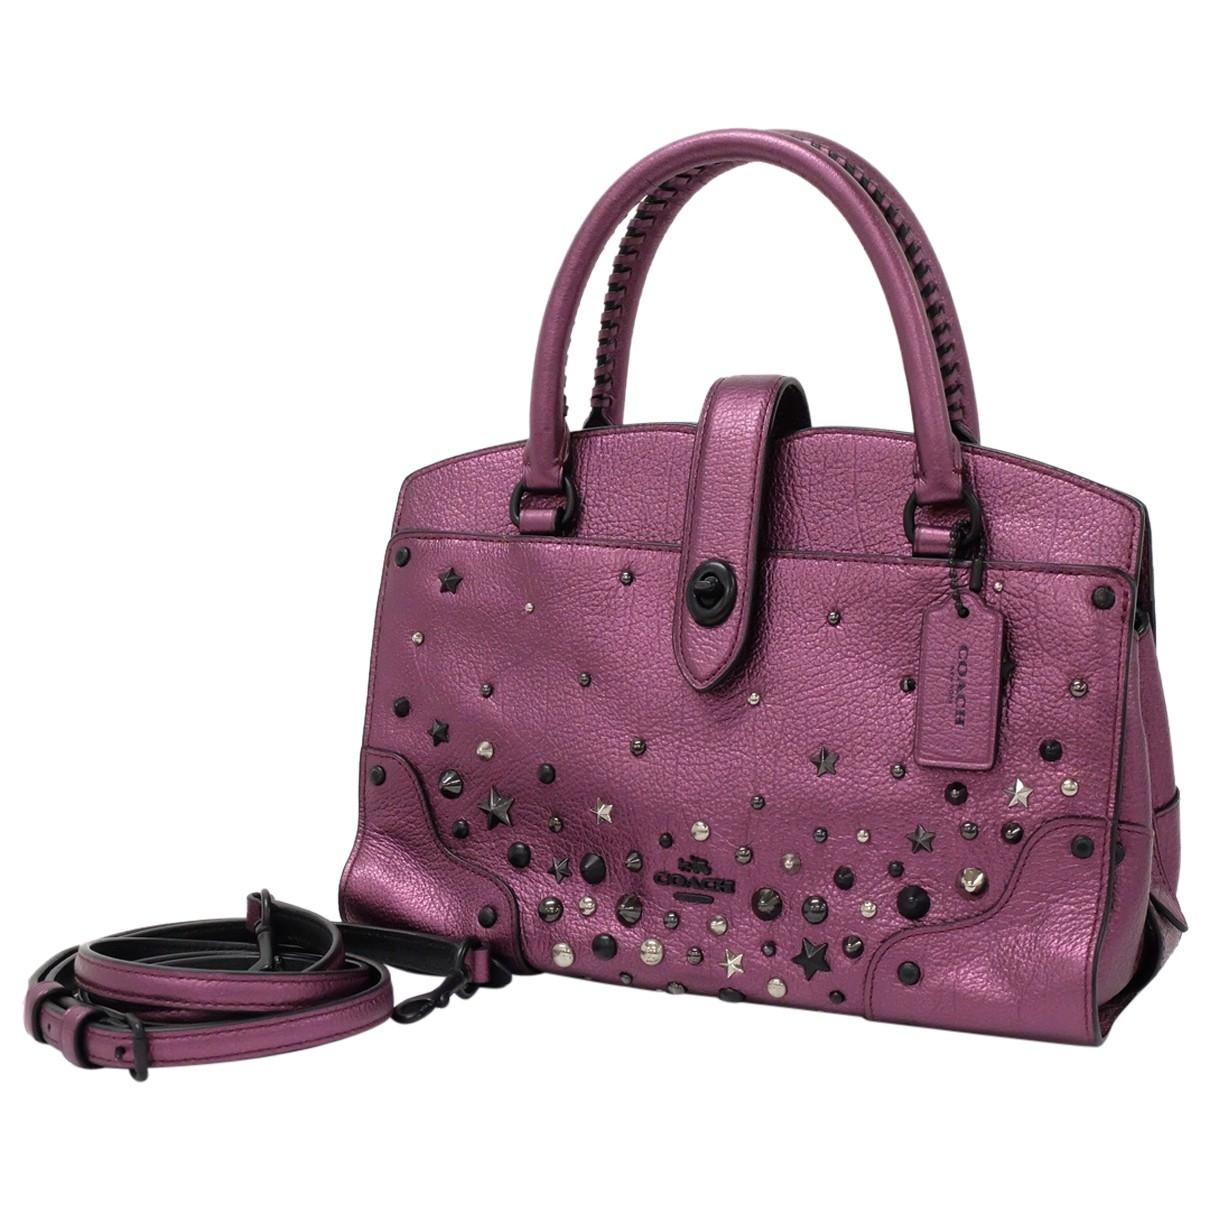 Coach \N Purple Leather handbag for Women \N